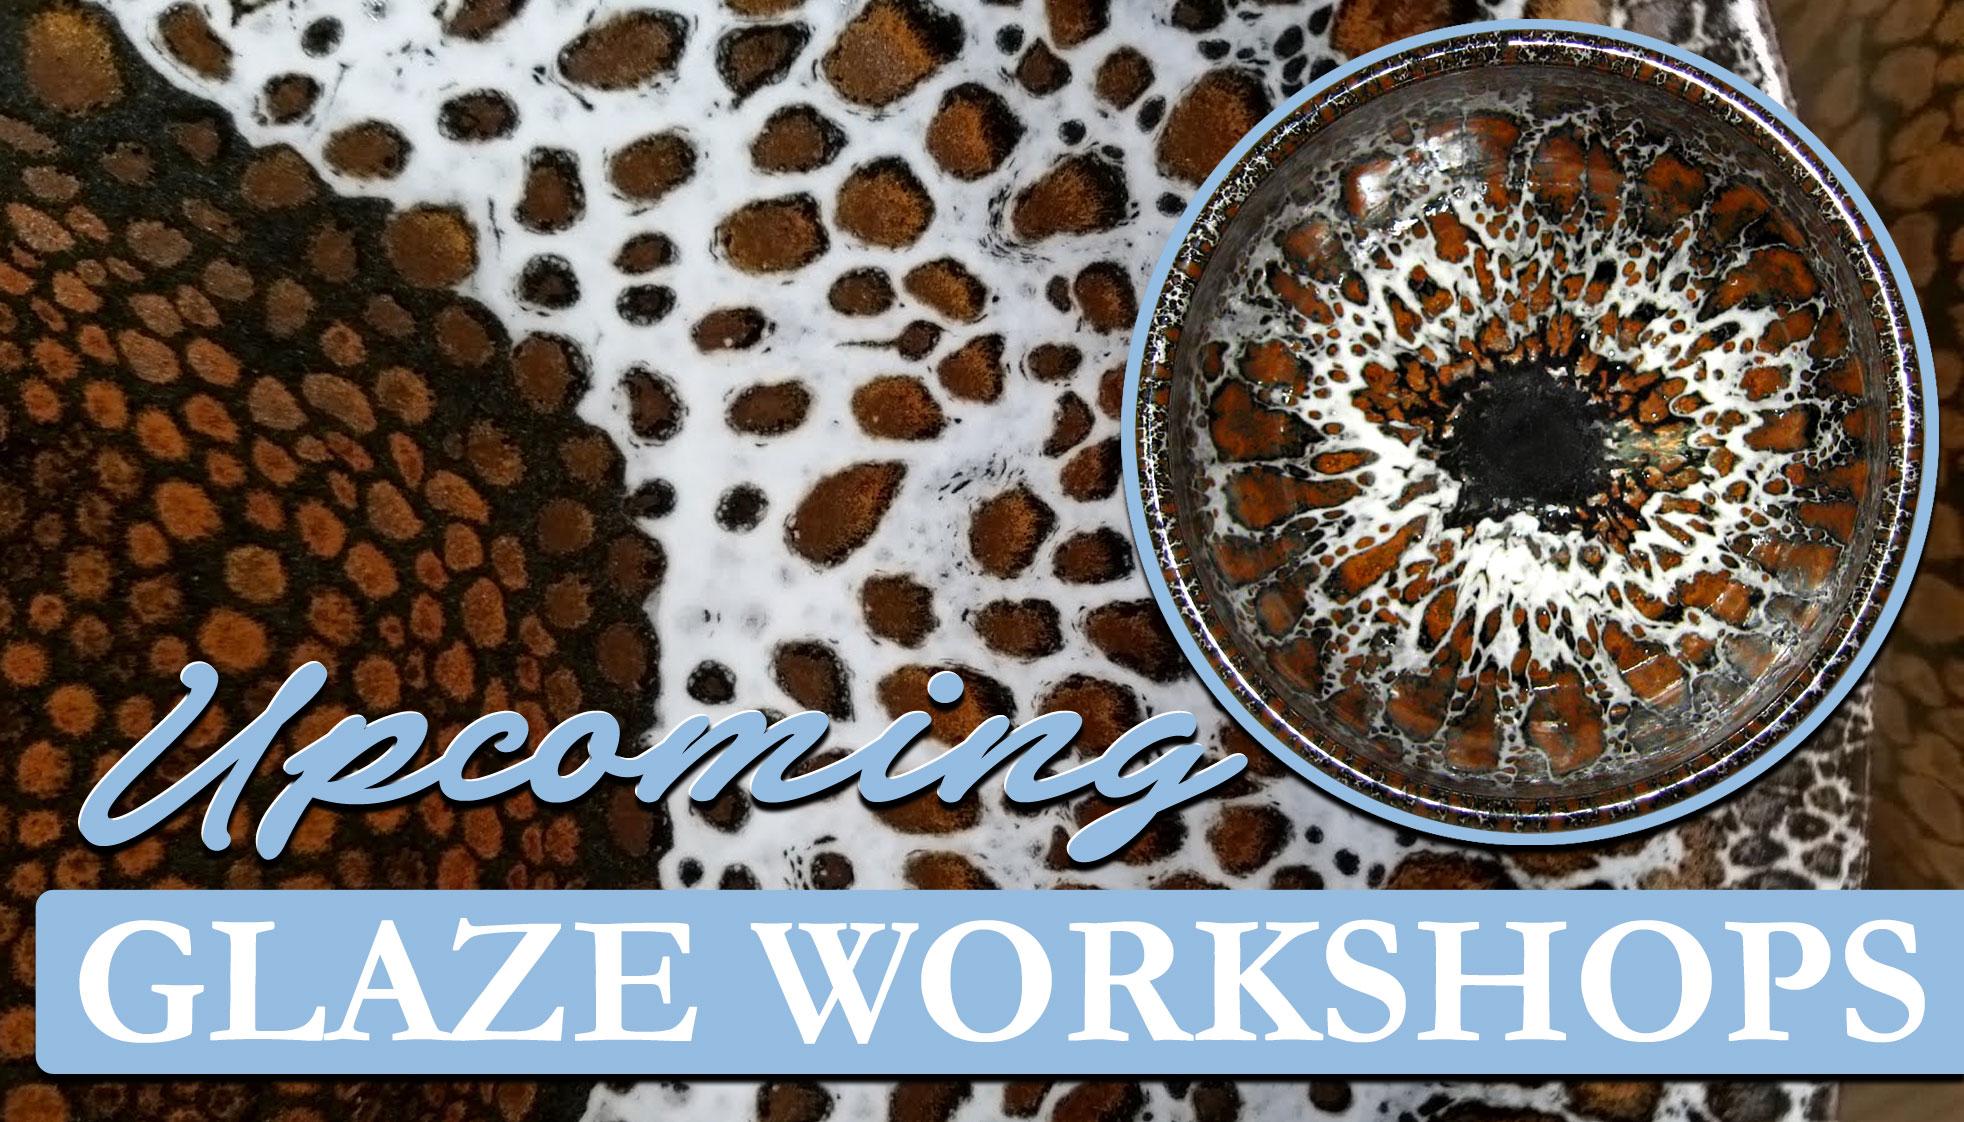 Glaze workshops